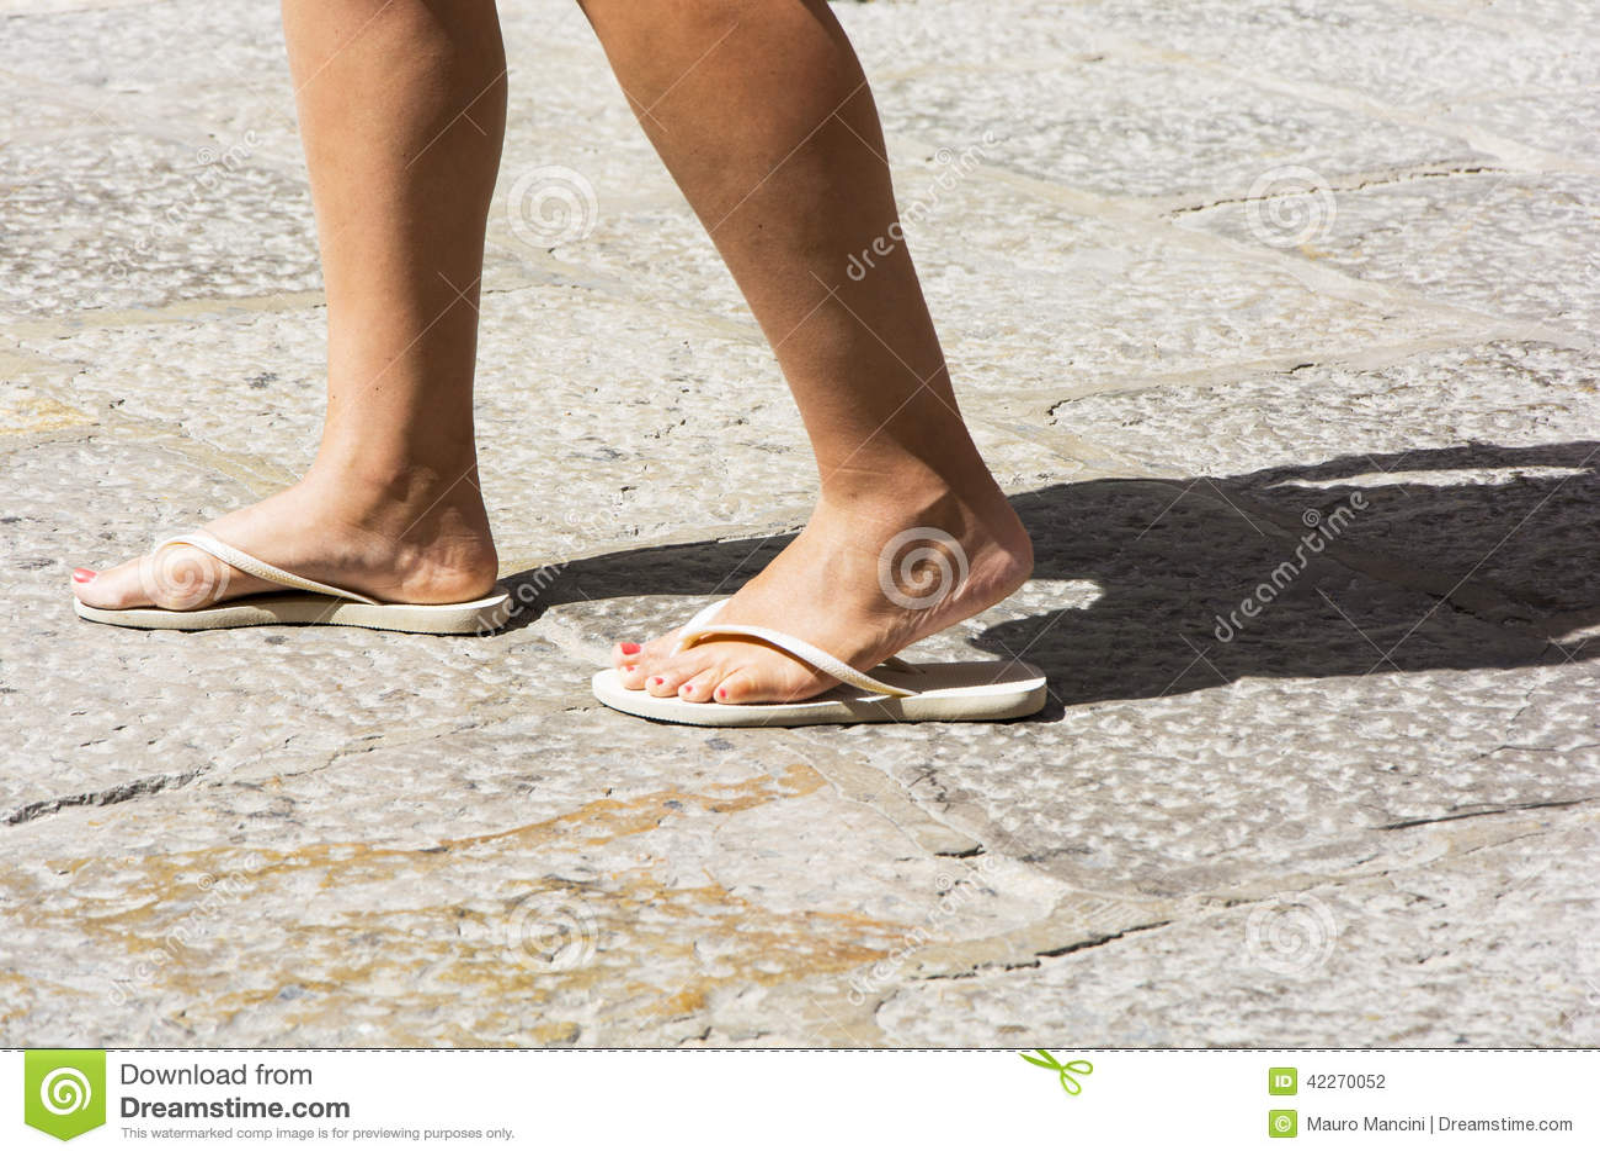 4a43736cf4c14 Female Feet Wearing White Flip-flops Stock Photo - Image of enjoying ...